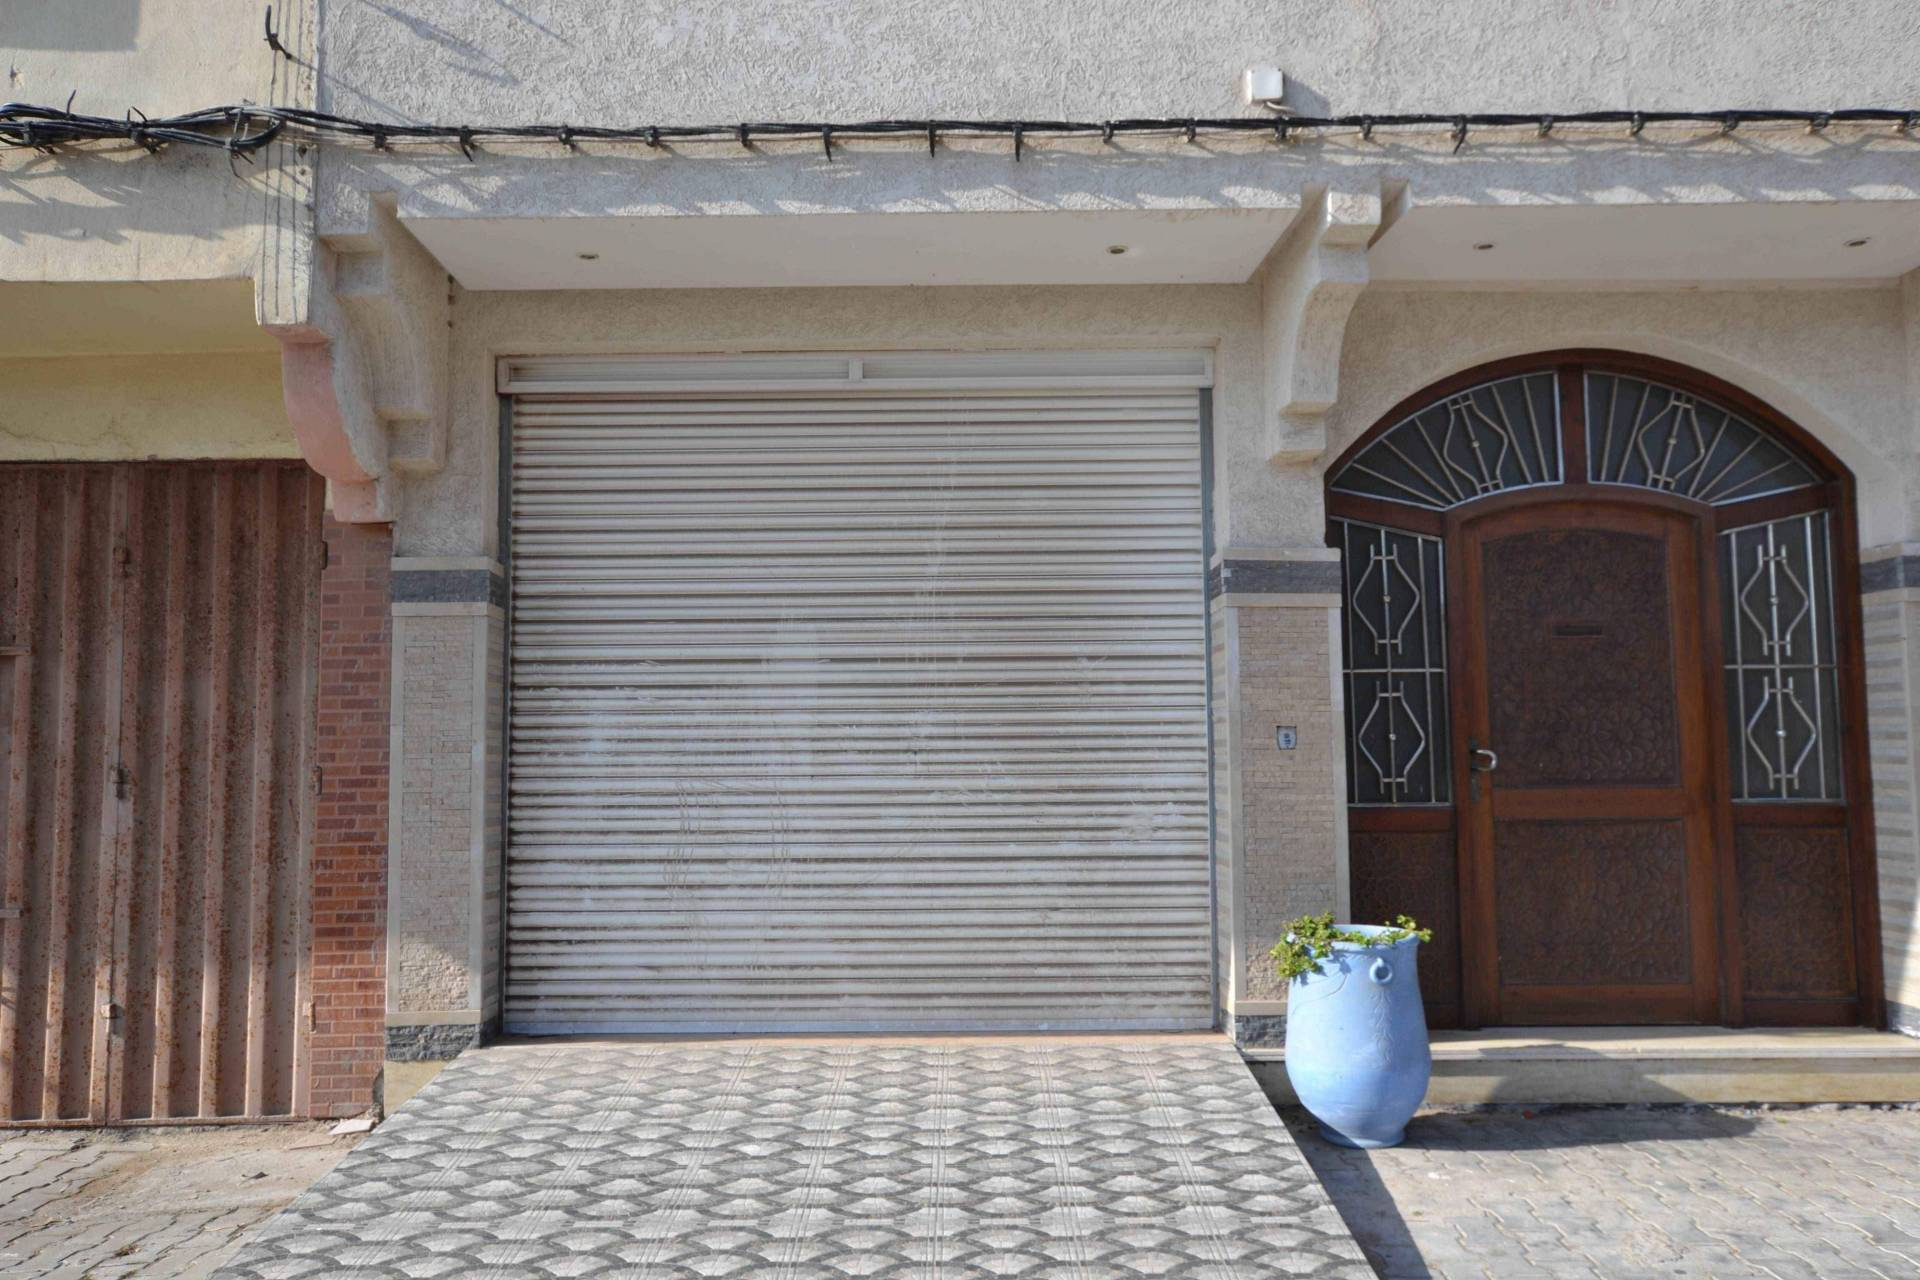 Vente Garage  Raounak (2)